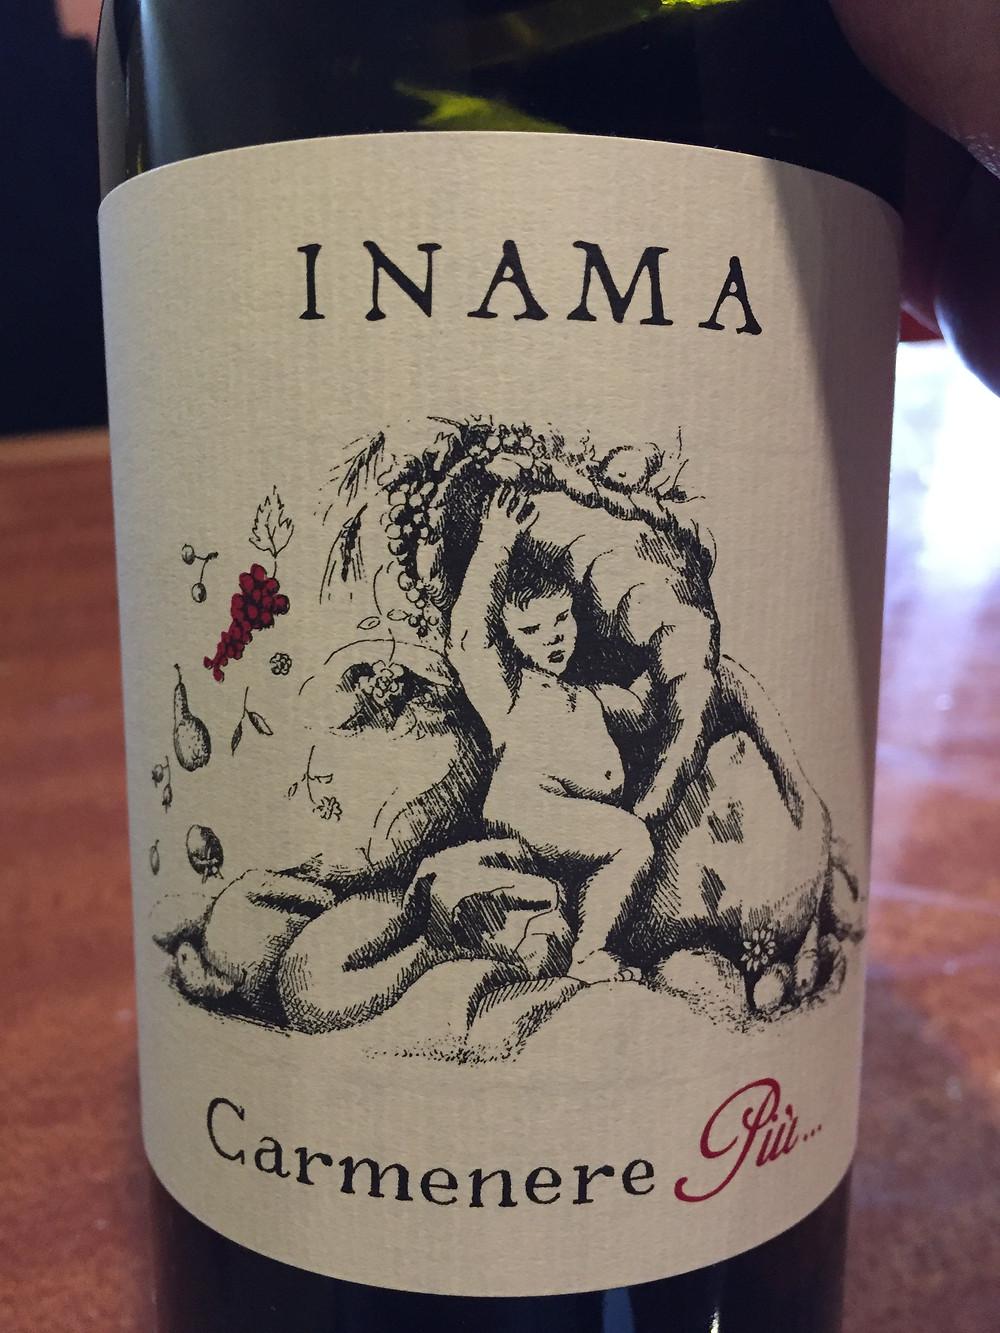 "2015 Inama ""Carménère cPiu"" Veneto Rosso IGT"